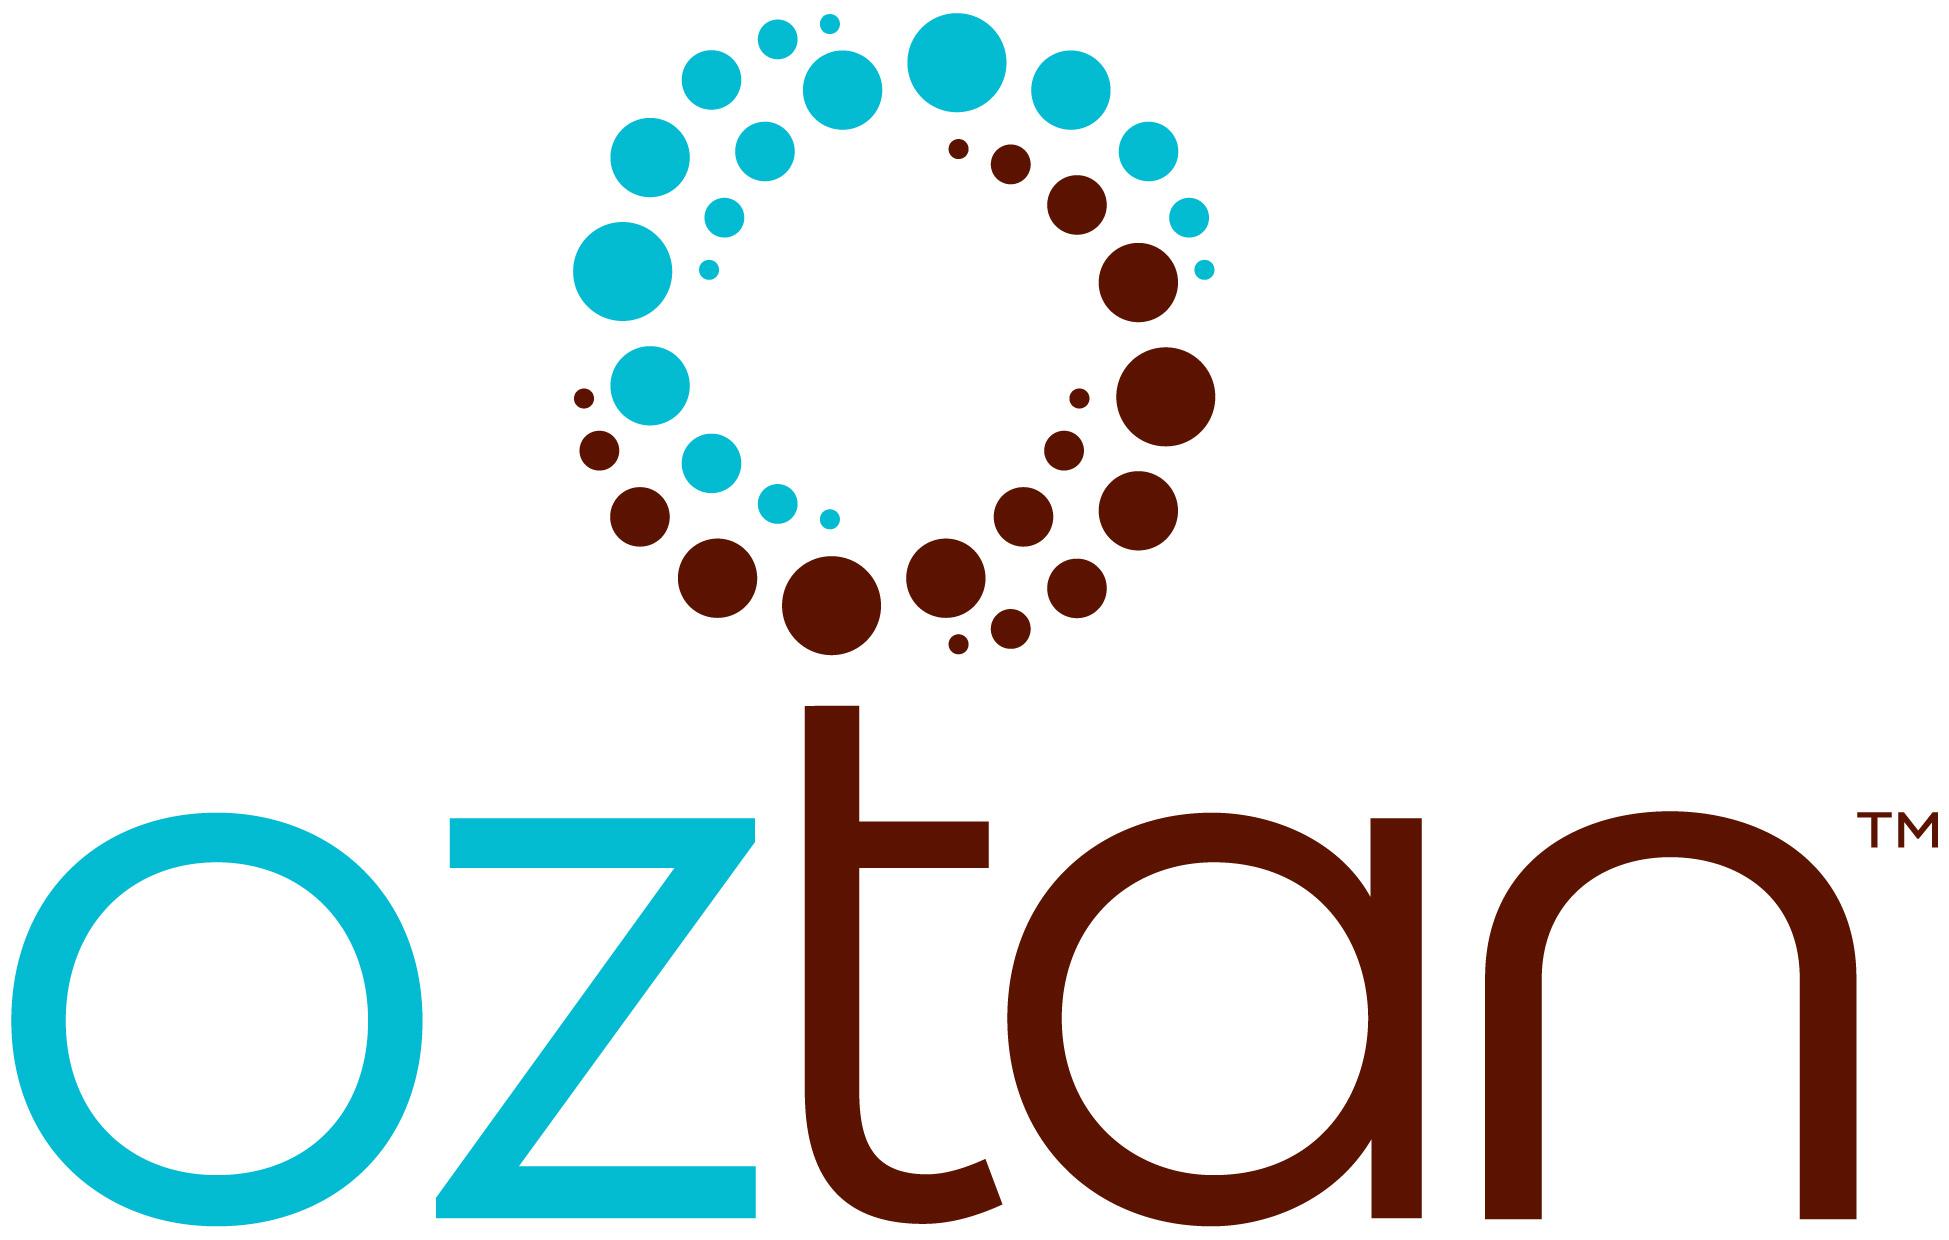 oztan-self-tan-cream-logo.jpg